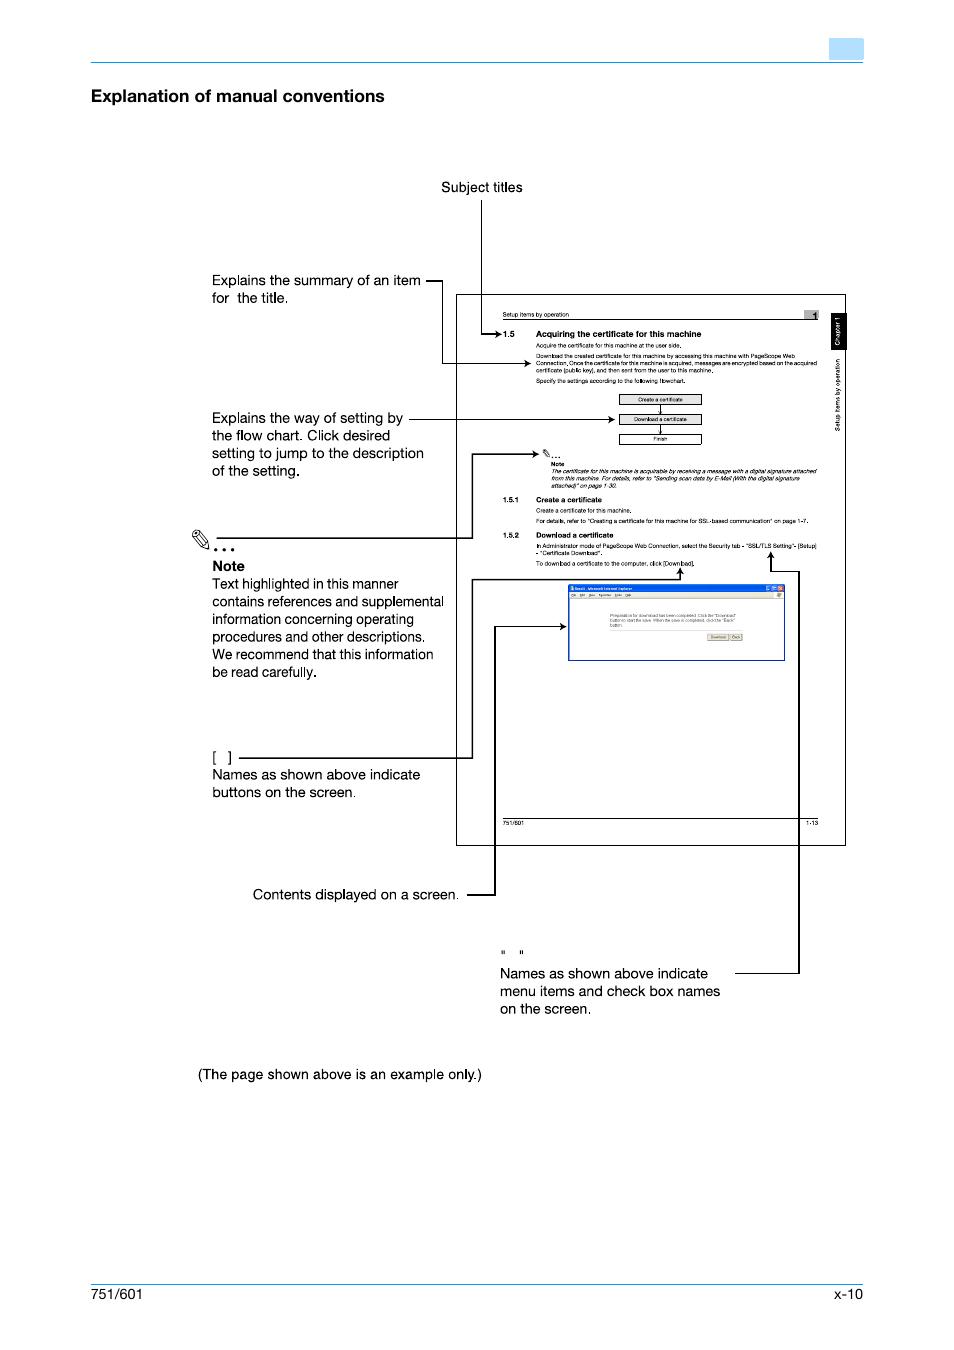 Explanation of manual conventions | Konica Minolta bizhub 601 User Manual |  Page 11 / 233